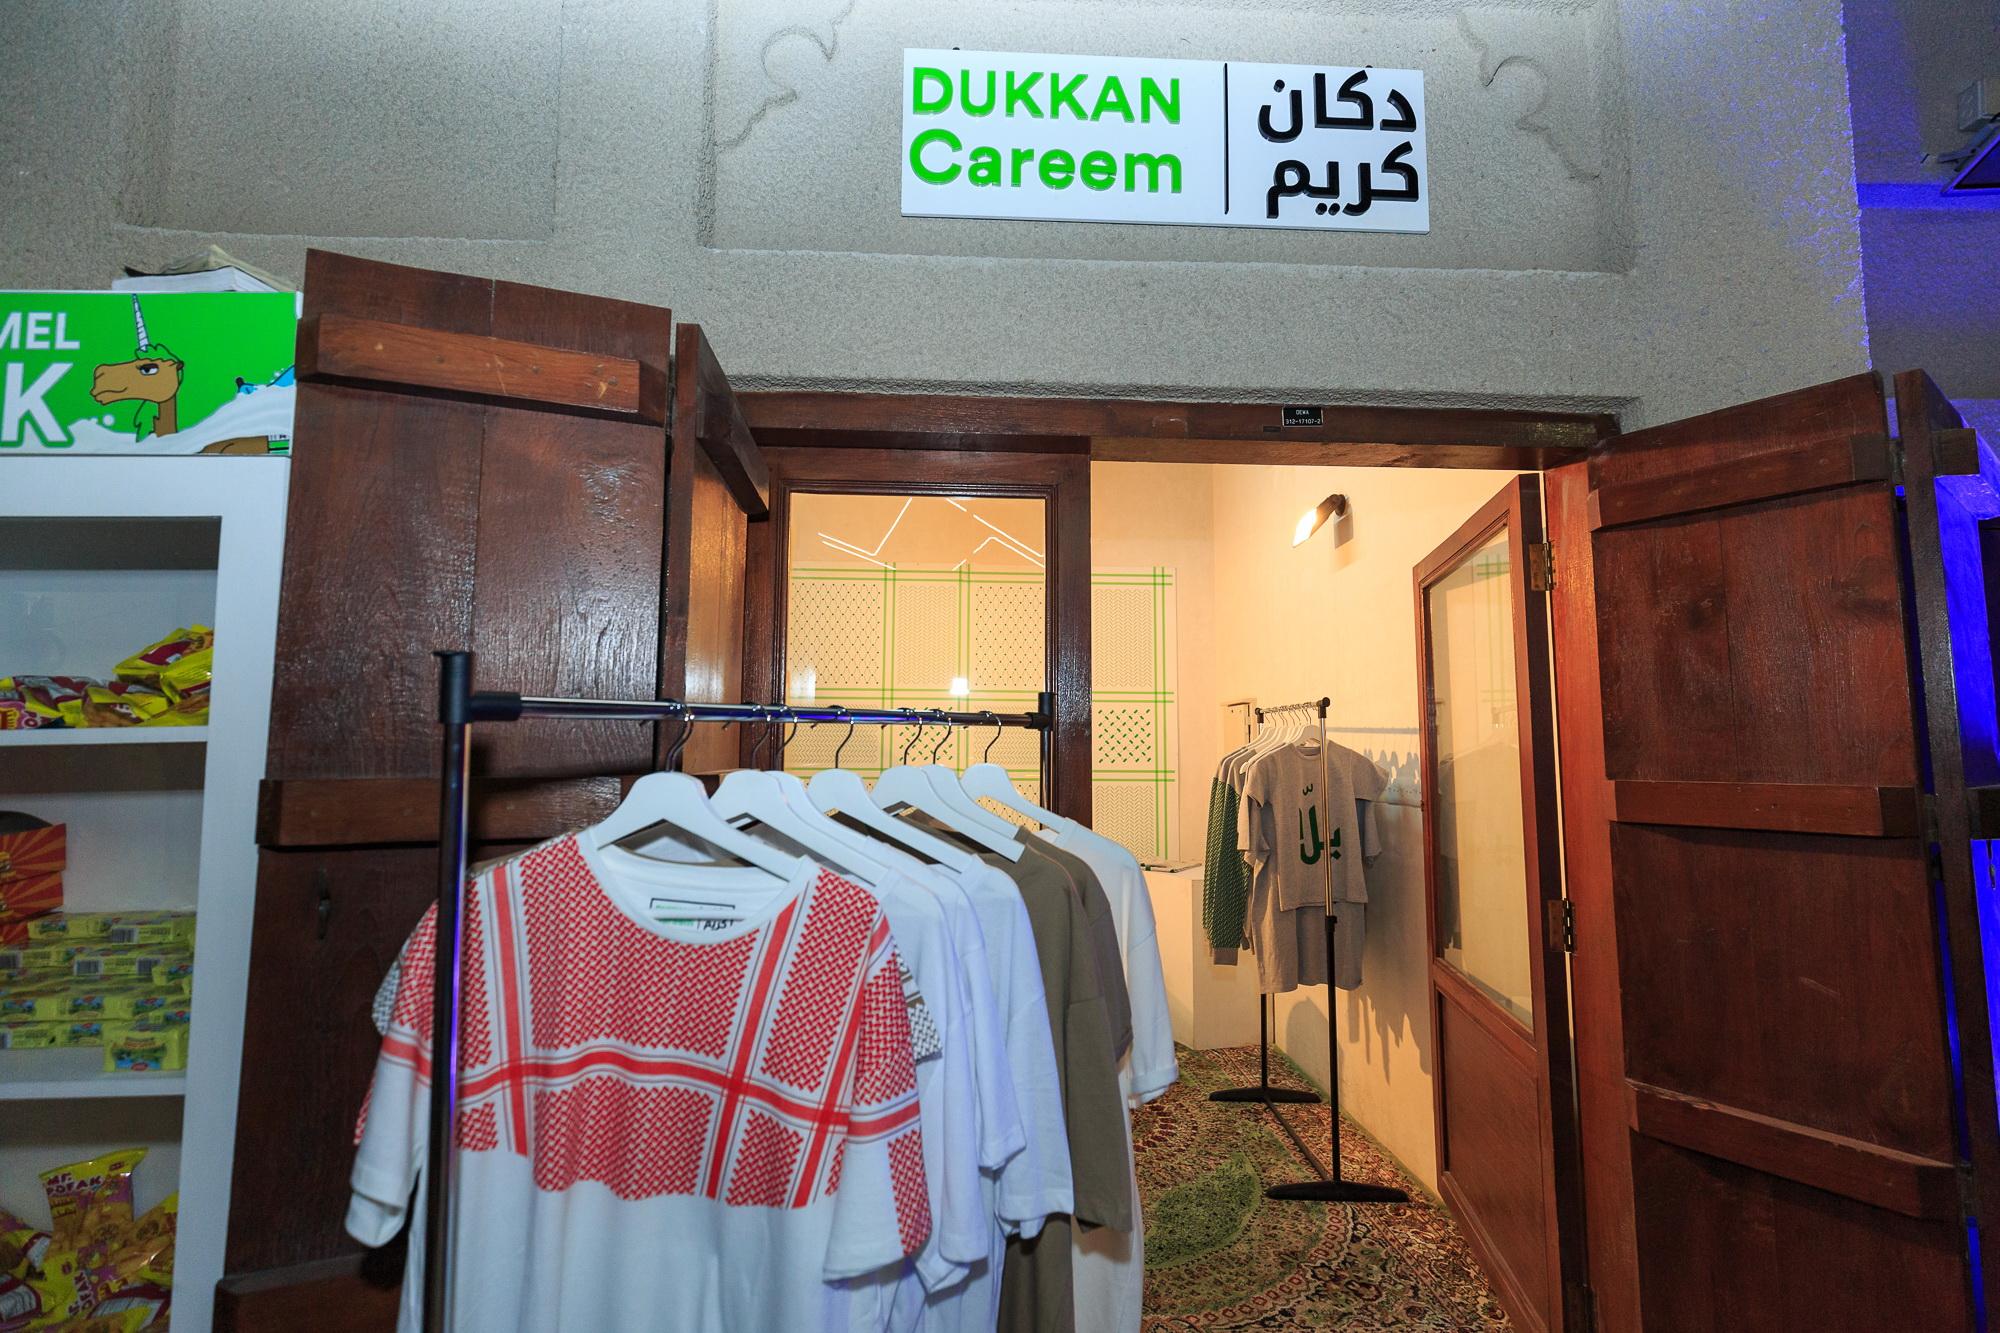 Sikka 2018 - Dukkan Careem - 010